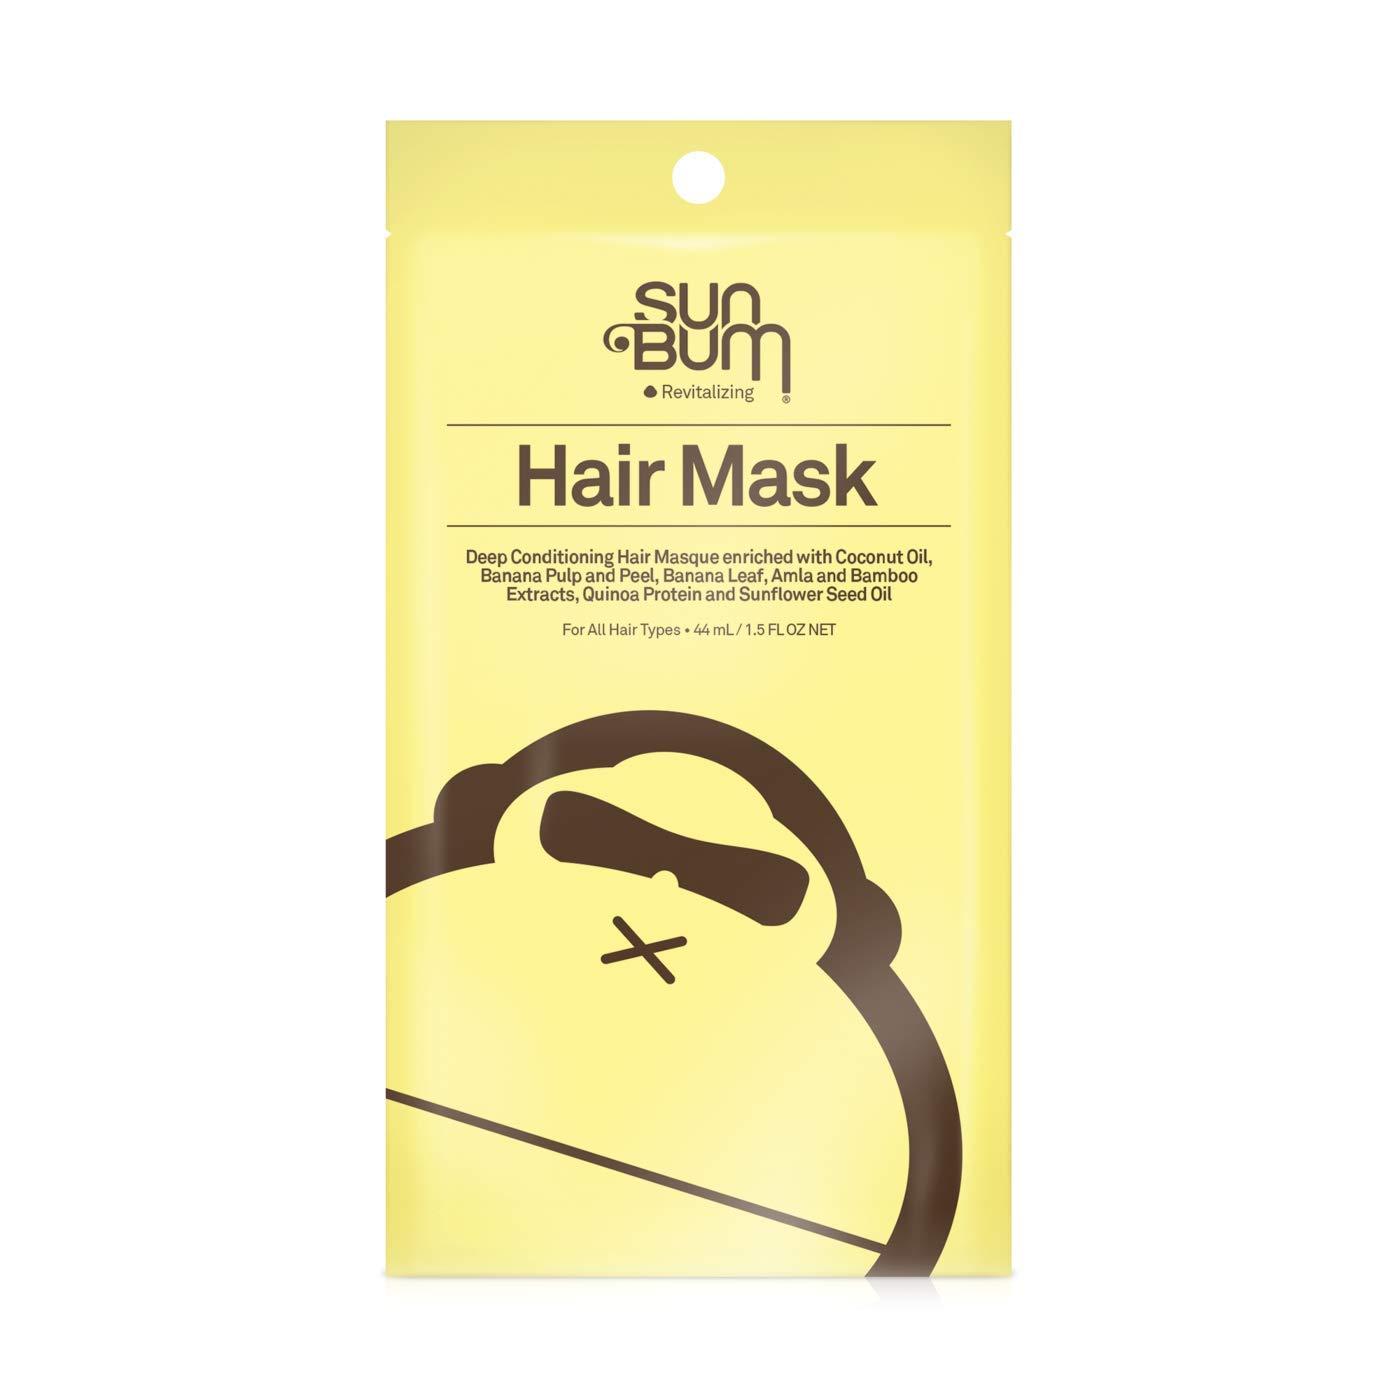 Sun Bum Revitalizing Deep Conditioning Hair Mask | Hydrating Deep Conditioning Mask for Damaged Hair | Frizz Control | Paraben Free, Gluten Free, Vegan | 1.5oz (5 Pack)